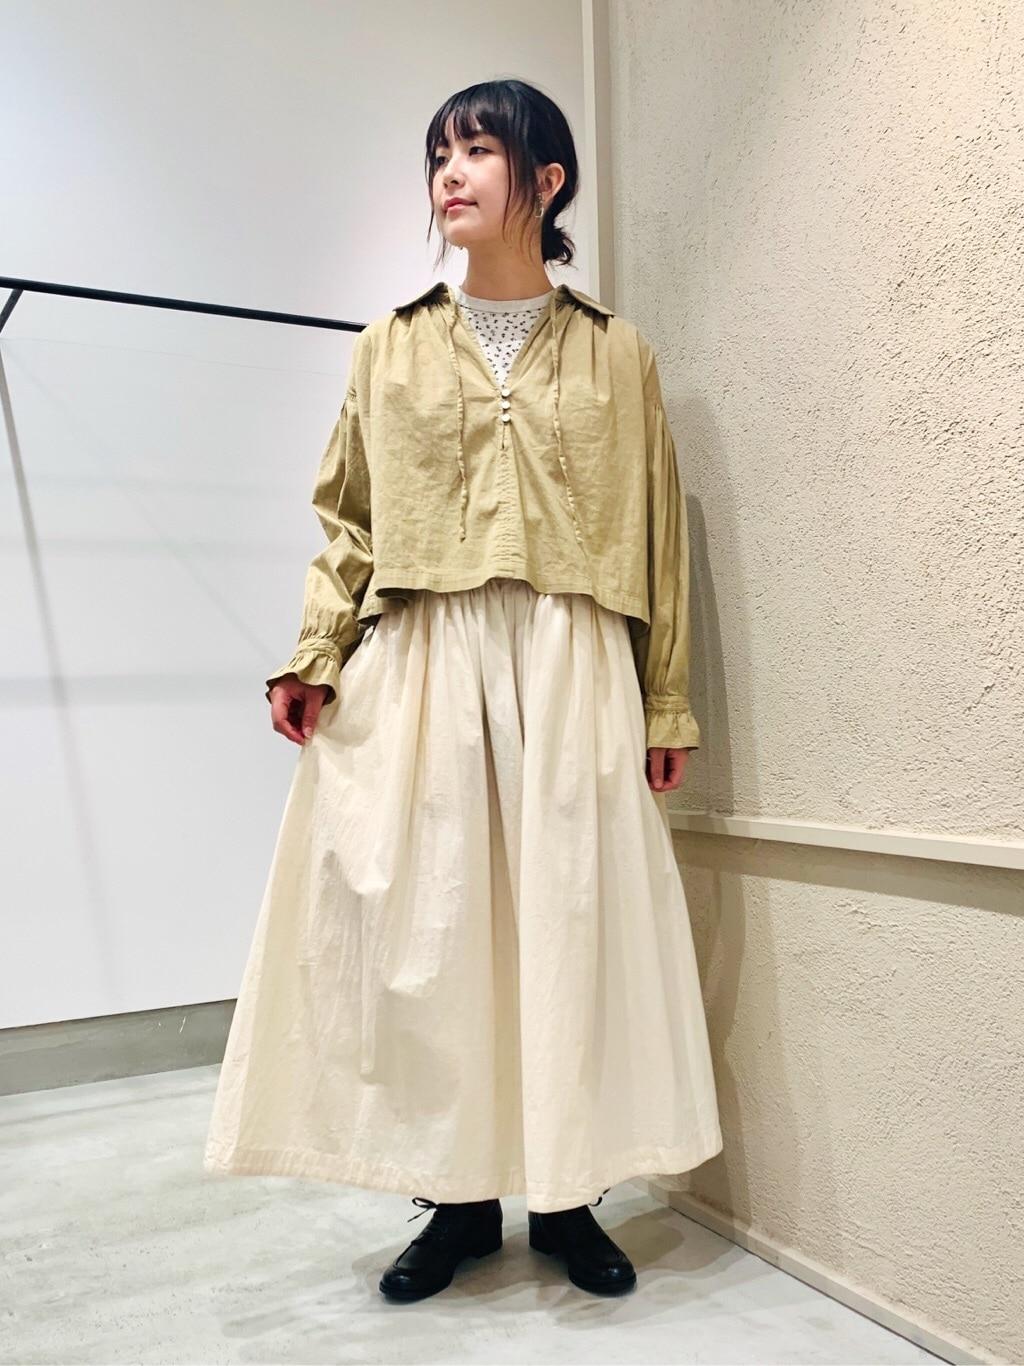 chambre de charme 横浜ジョイナス 身長:162cm 2021.01.05